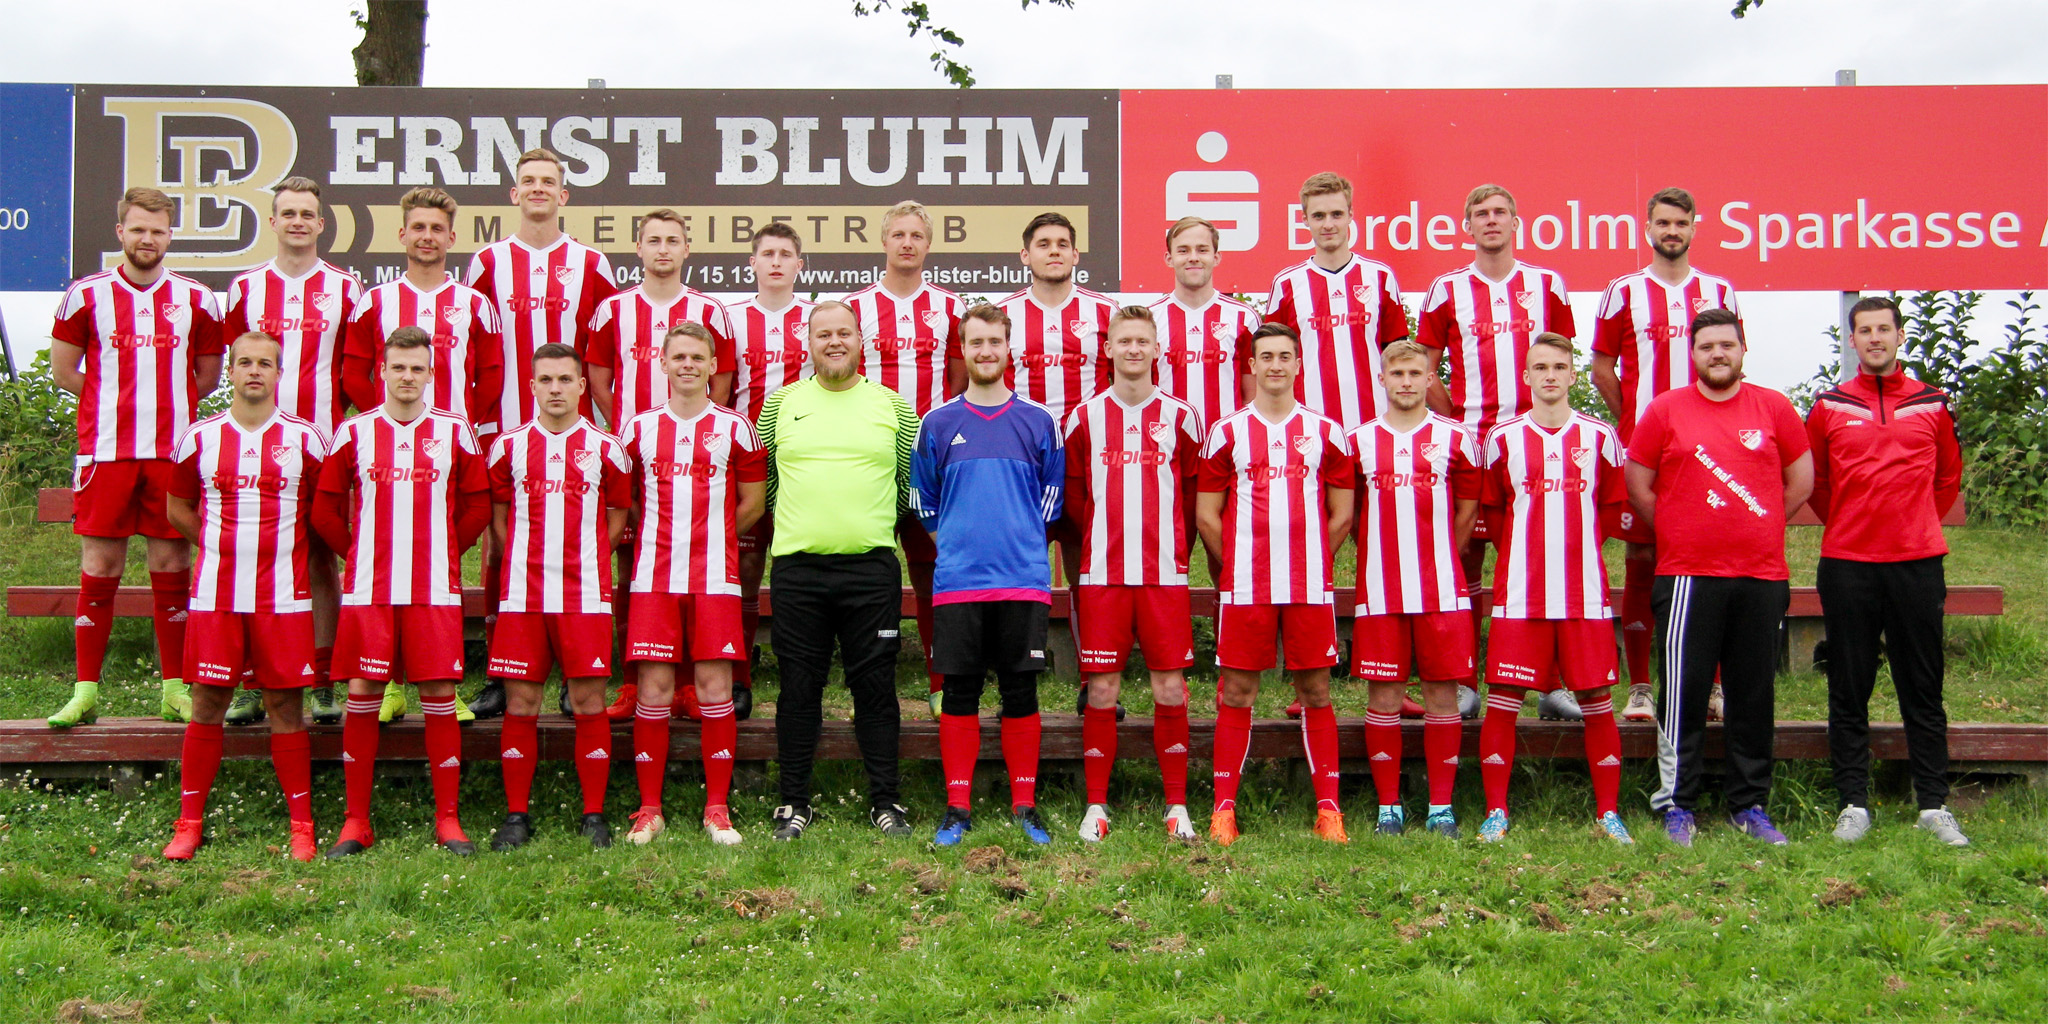 TSV Flintbek - Fussball - 2. Herren 2019/20